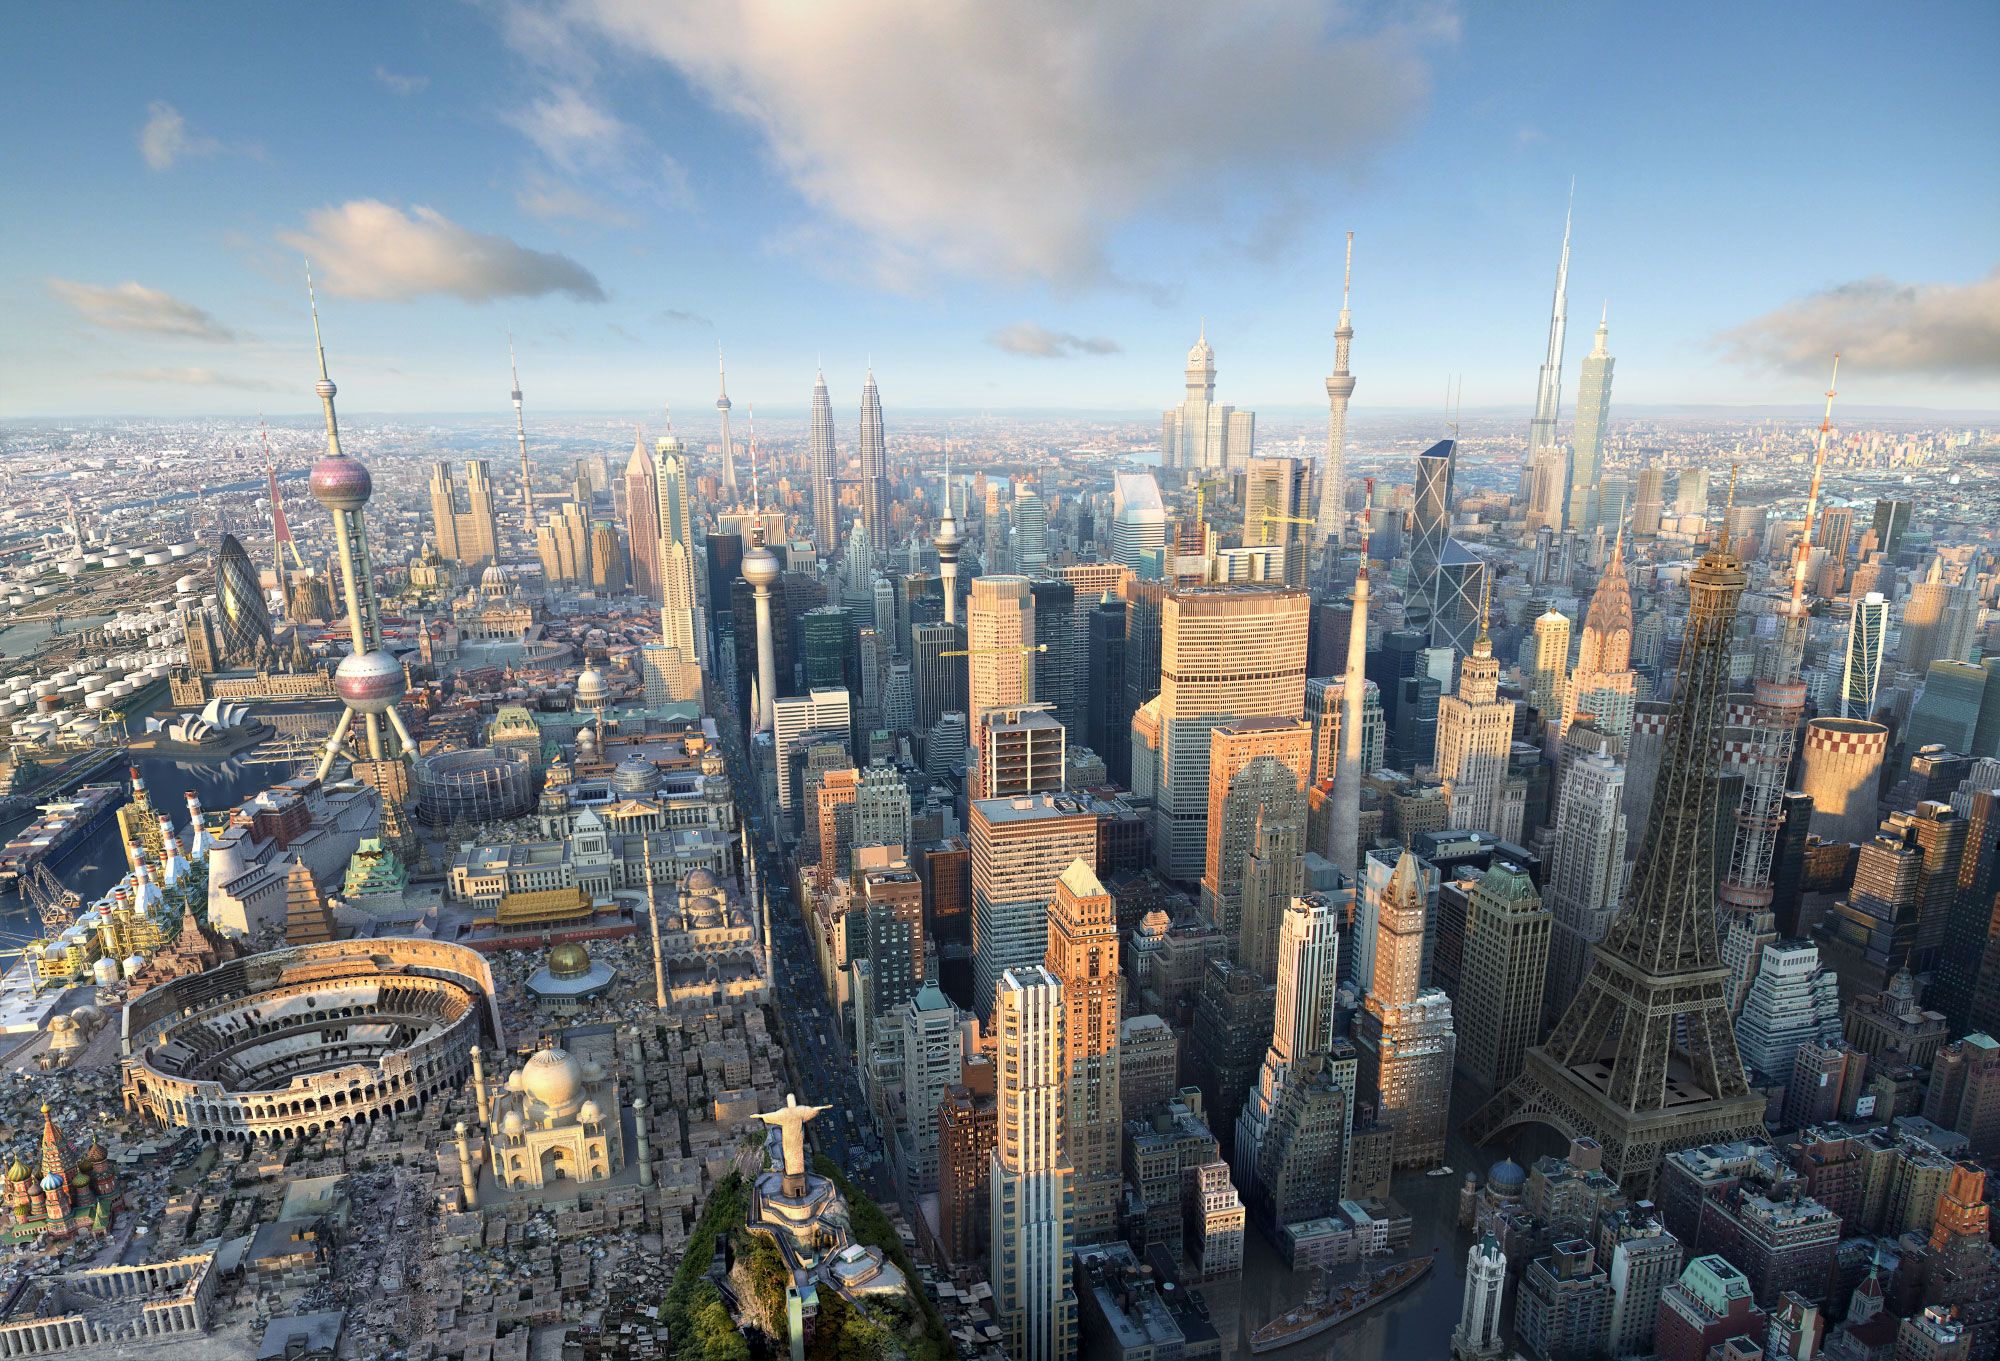 Earth City